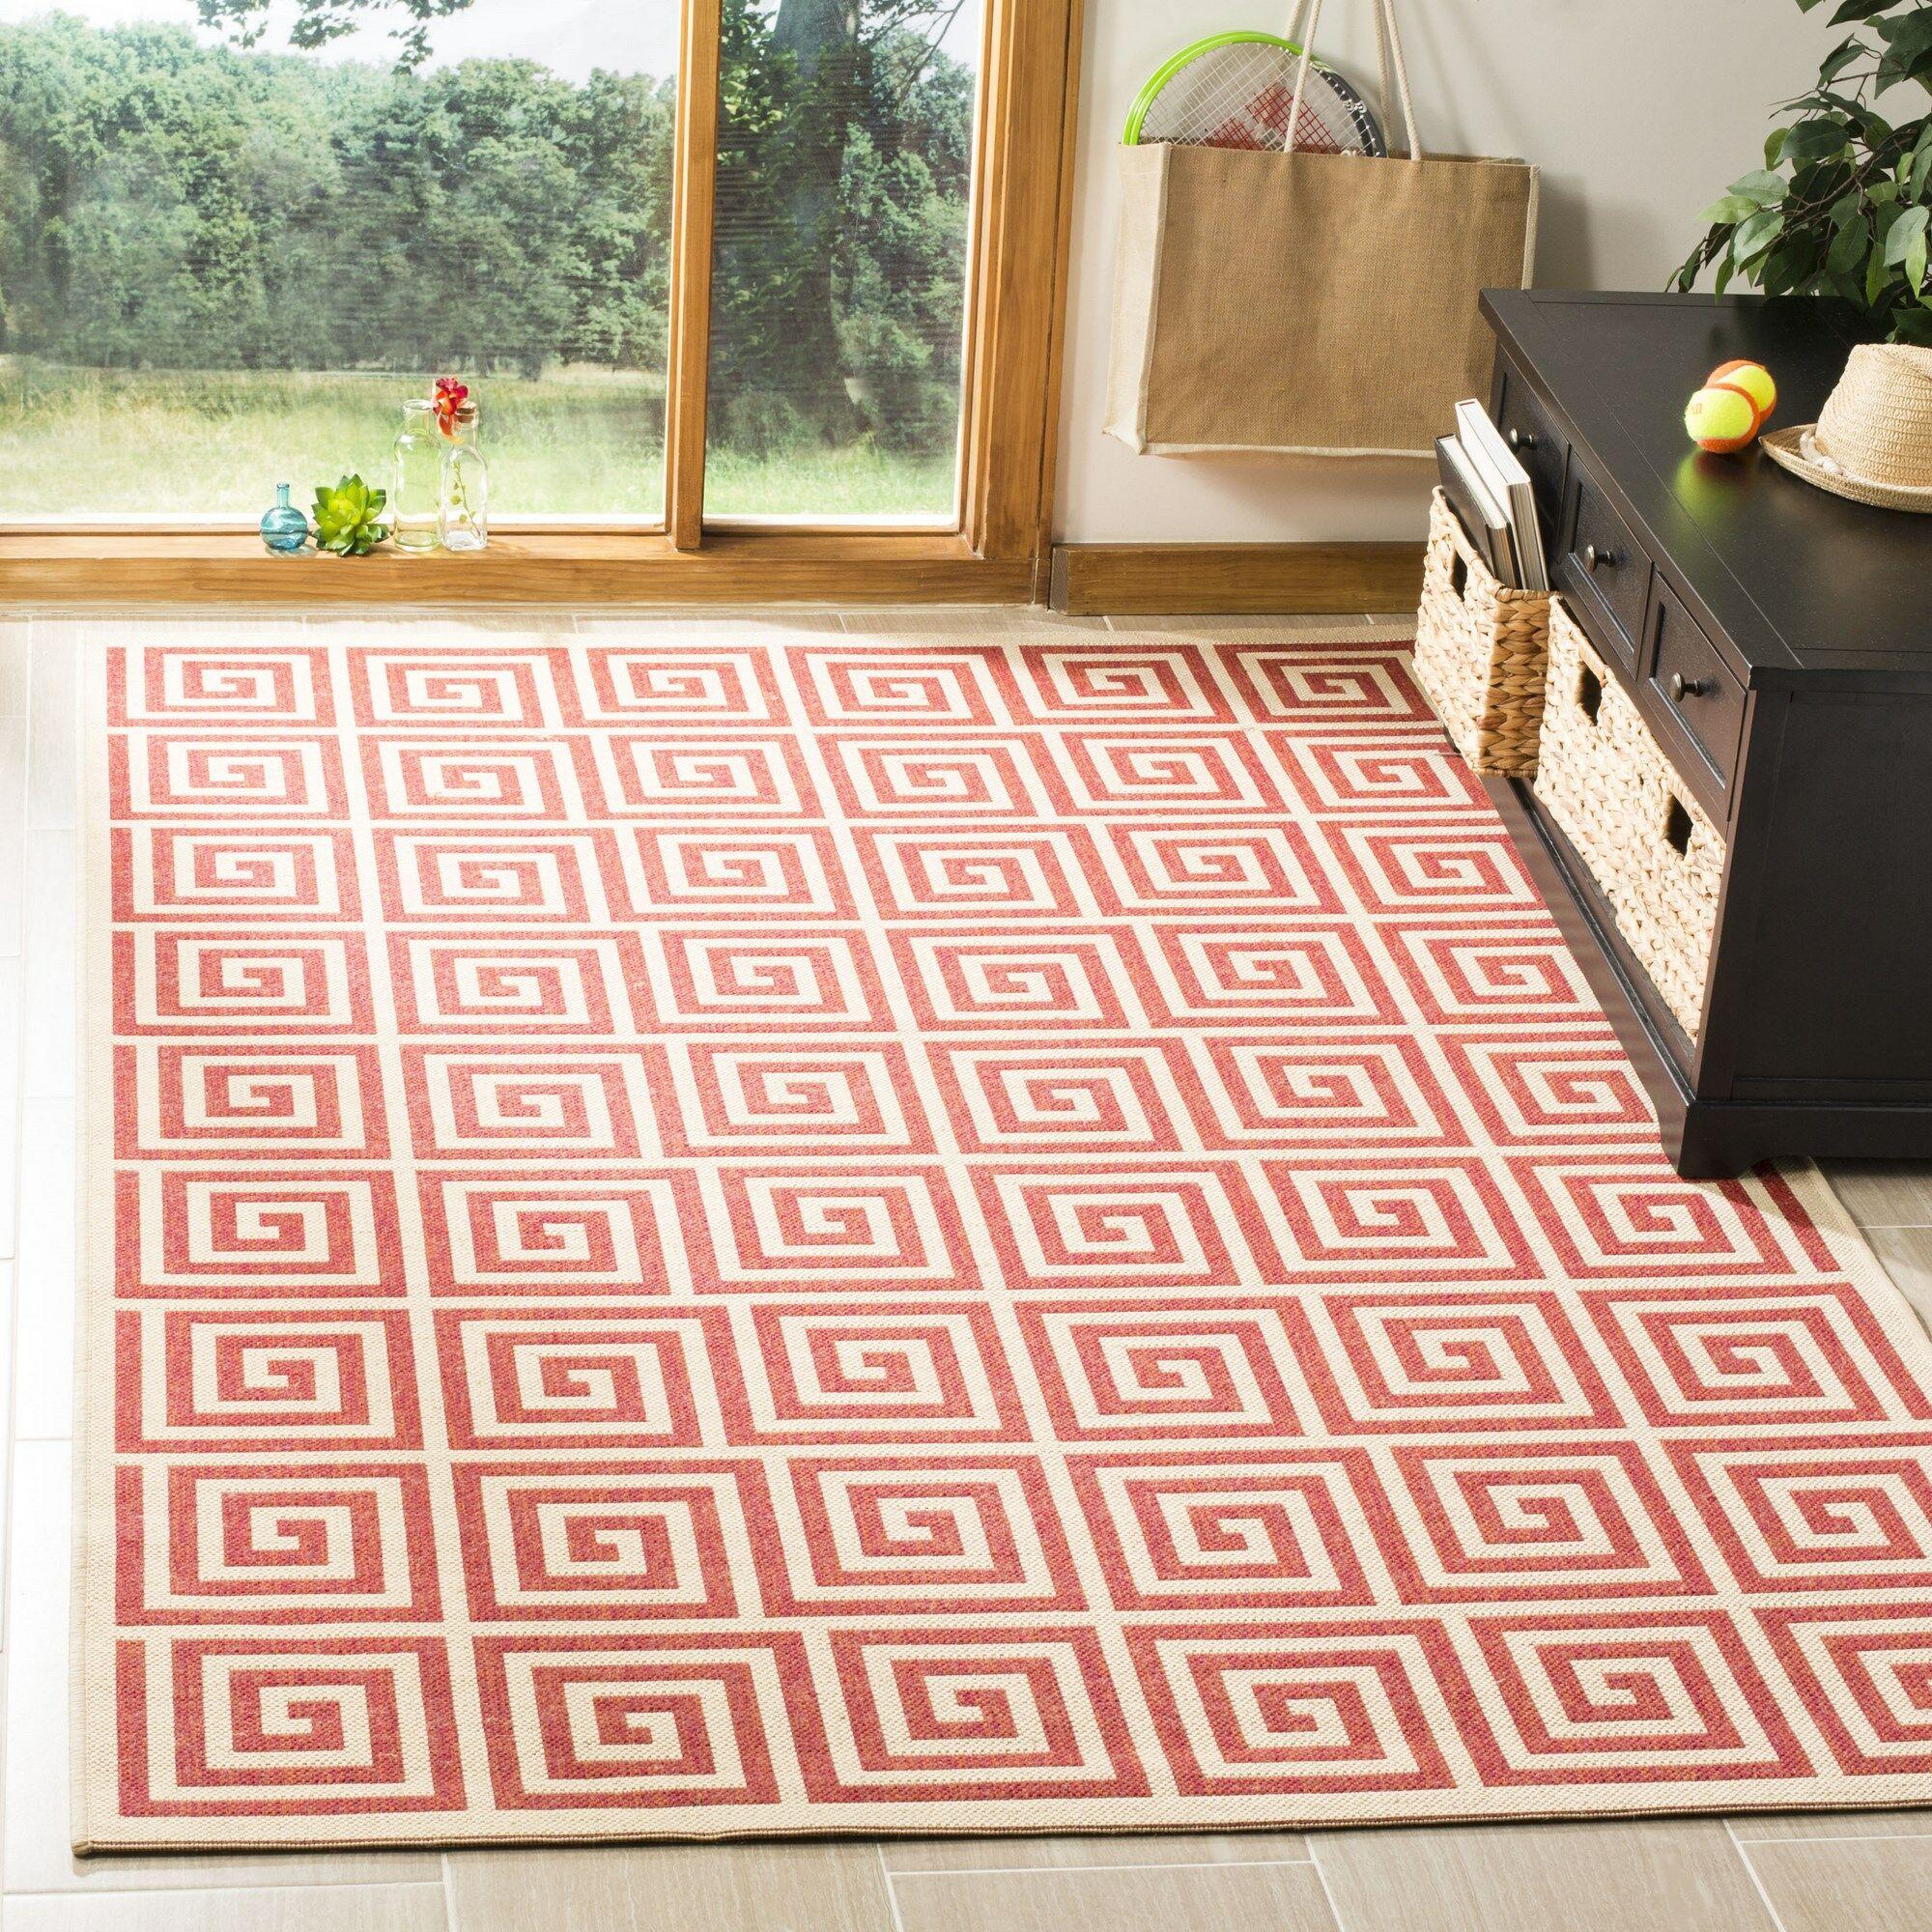 Katsikis Red/Creme Area Rug Rug Size: Rectangle 5'1